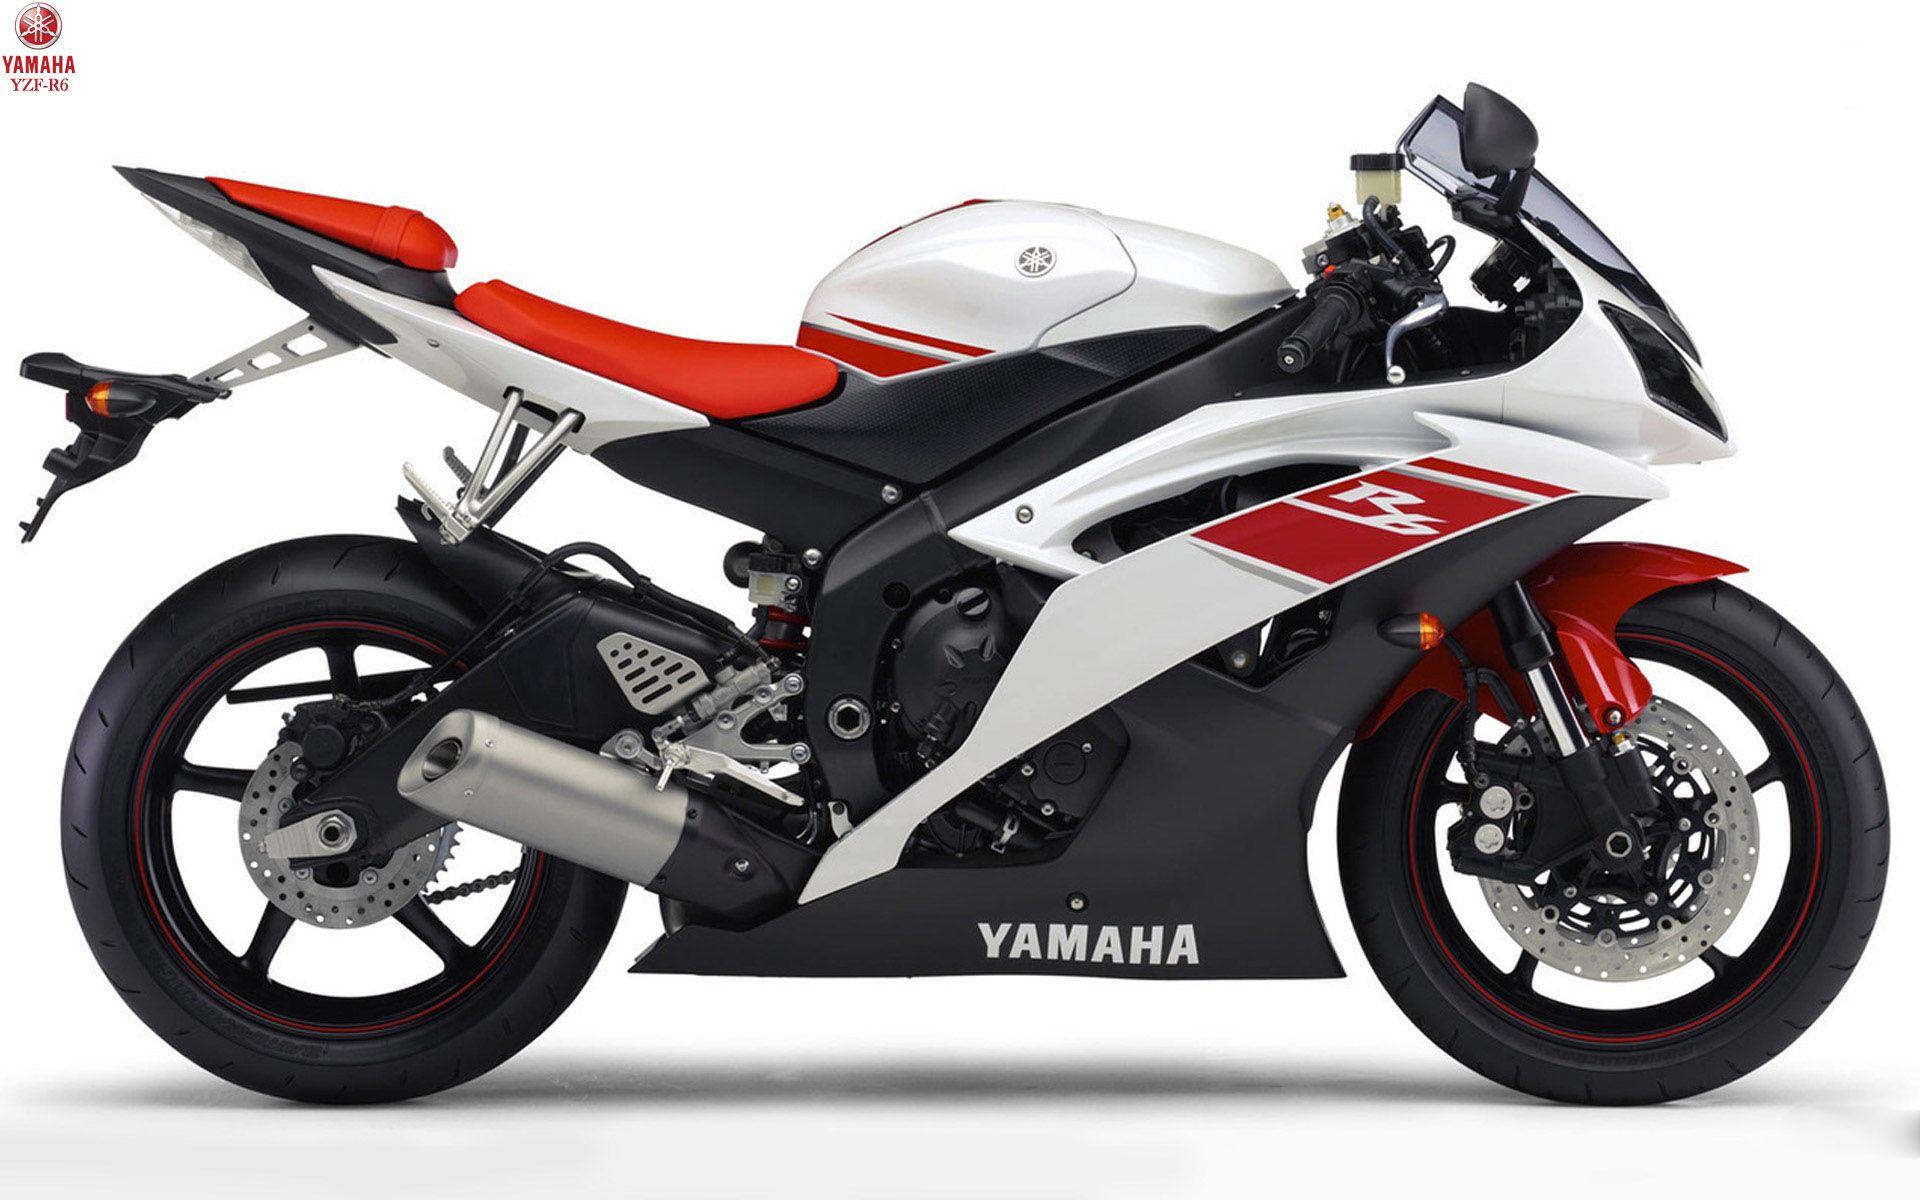 Yamaha yzf r6 hd wallpapers